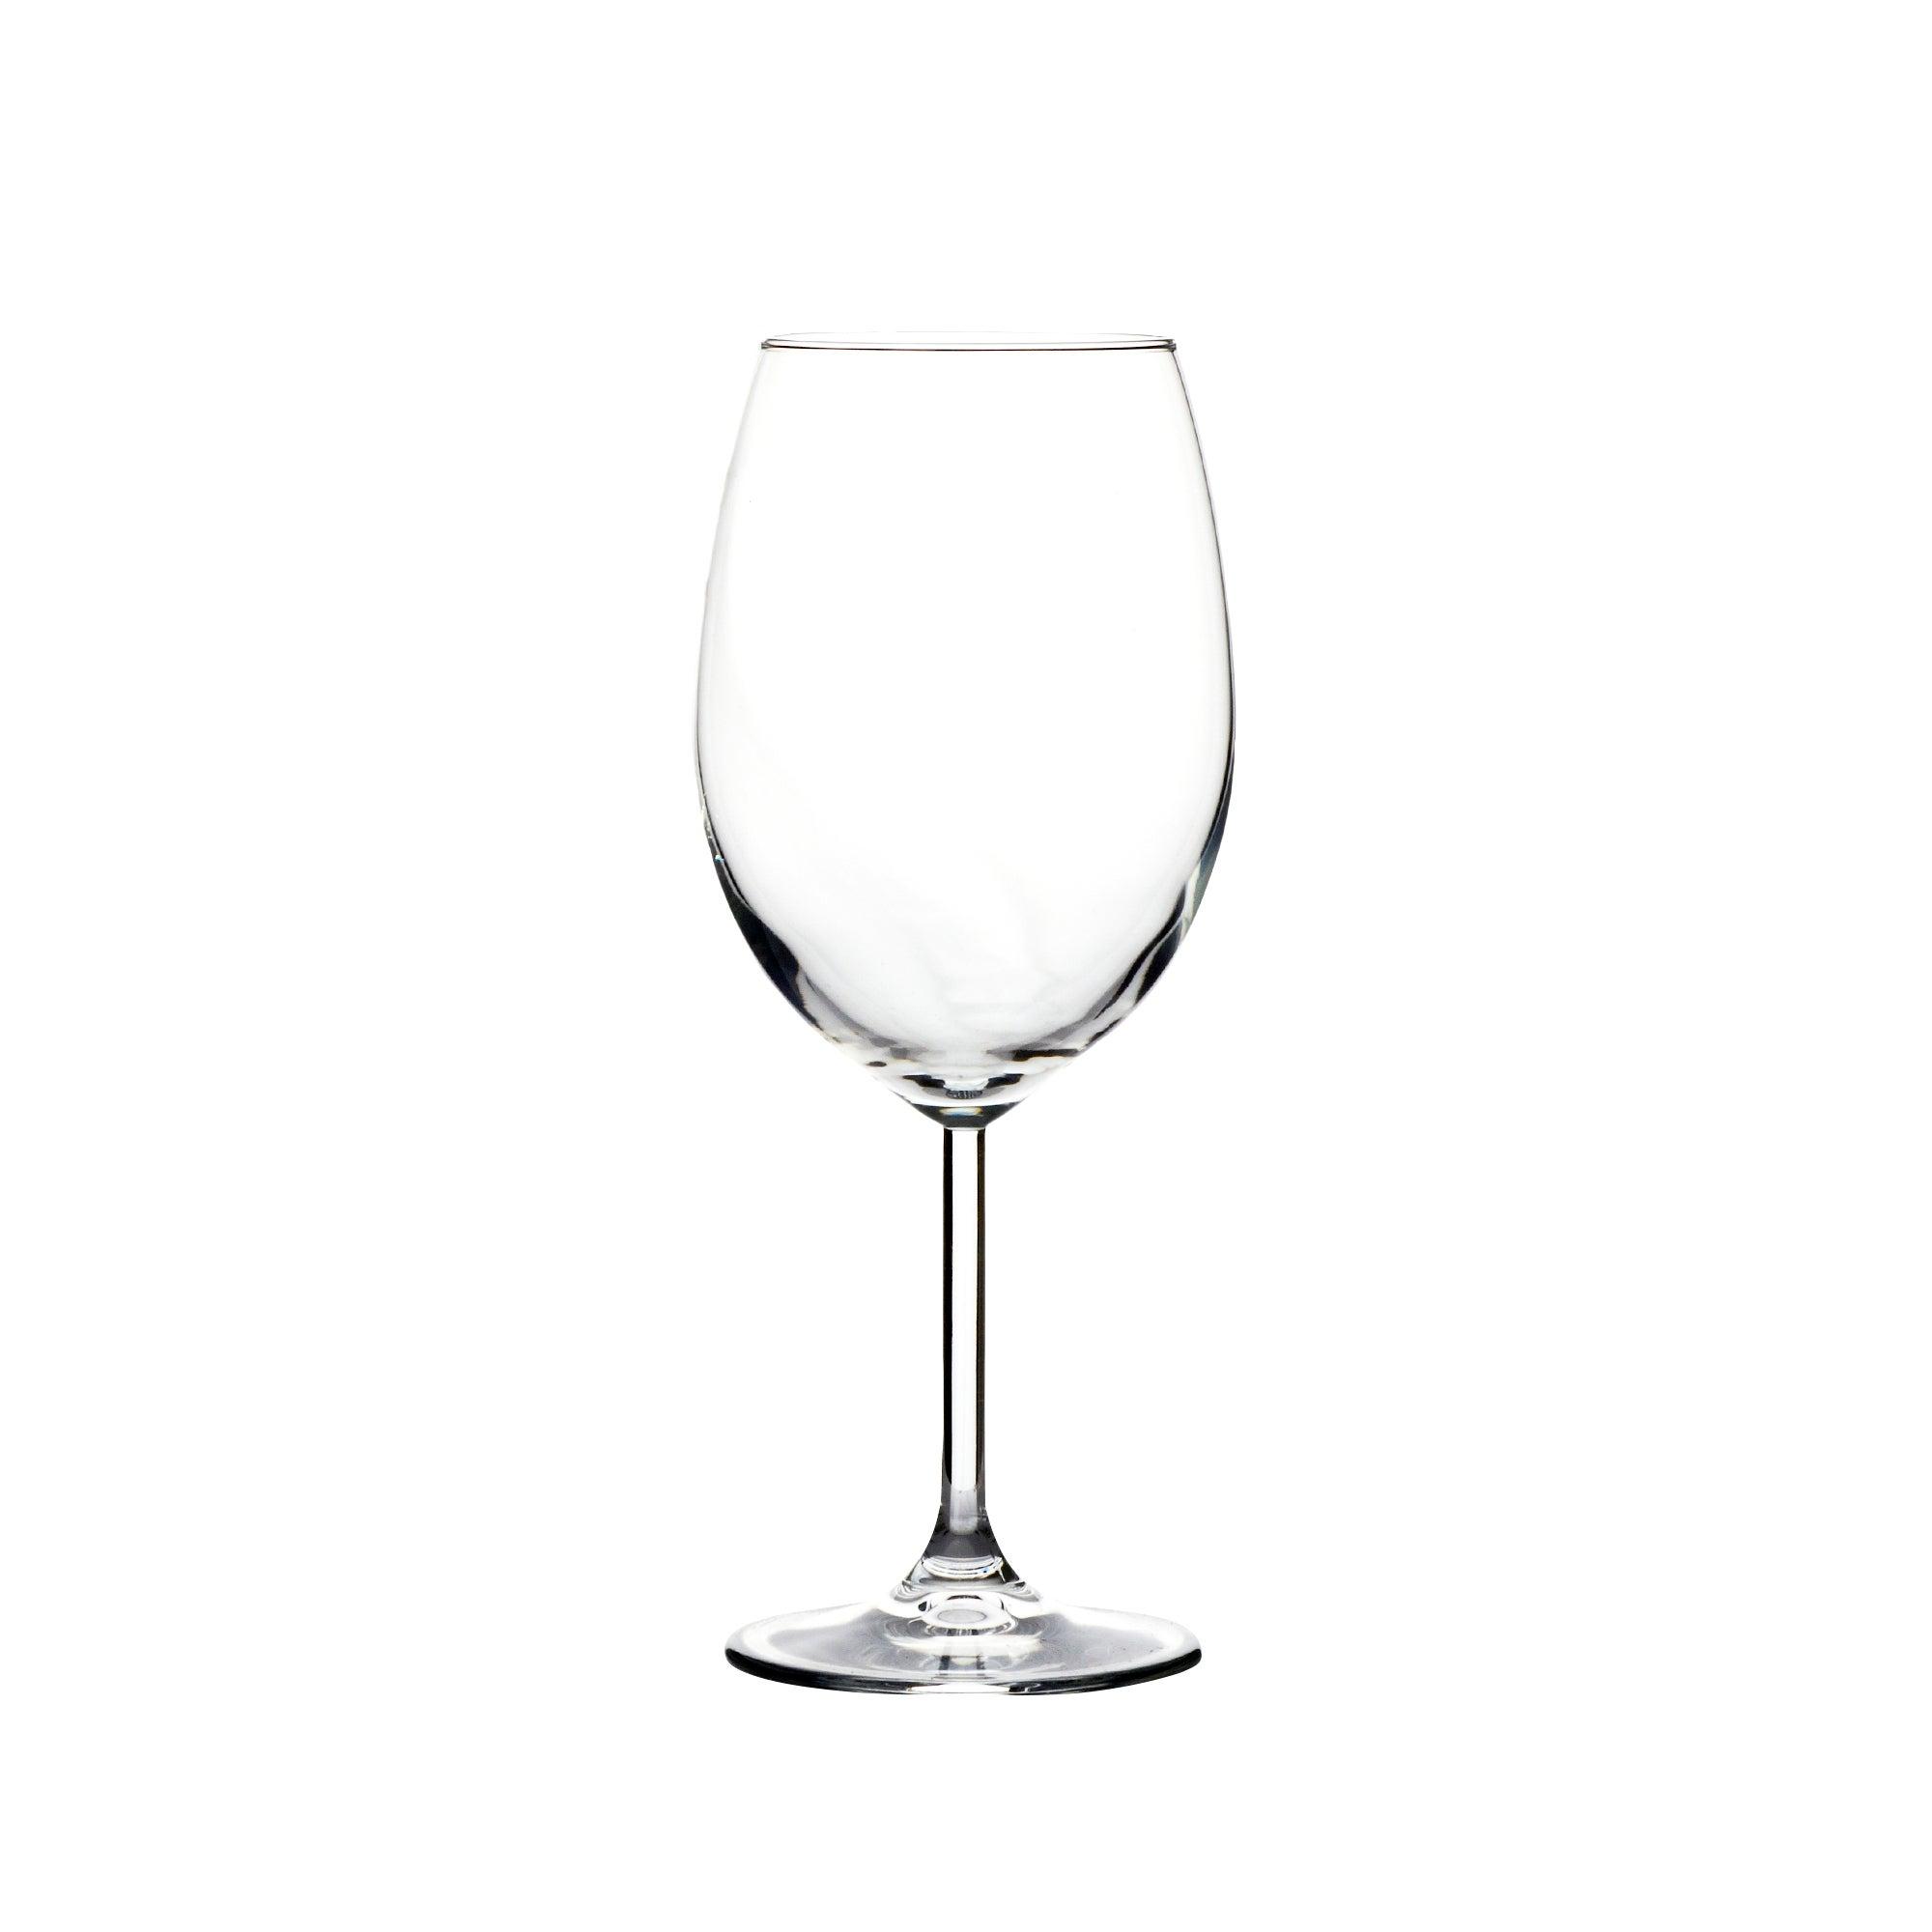 Sidara 44cl Wine Glass